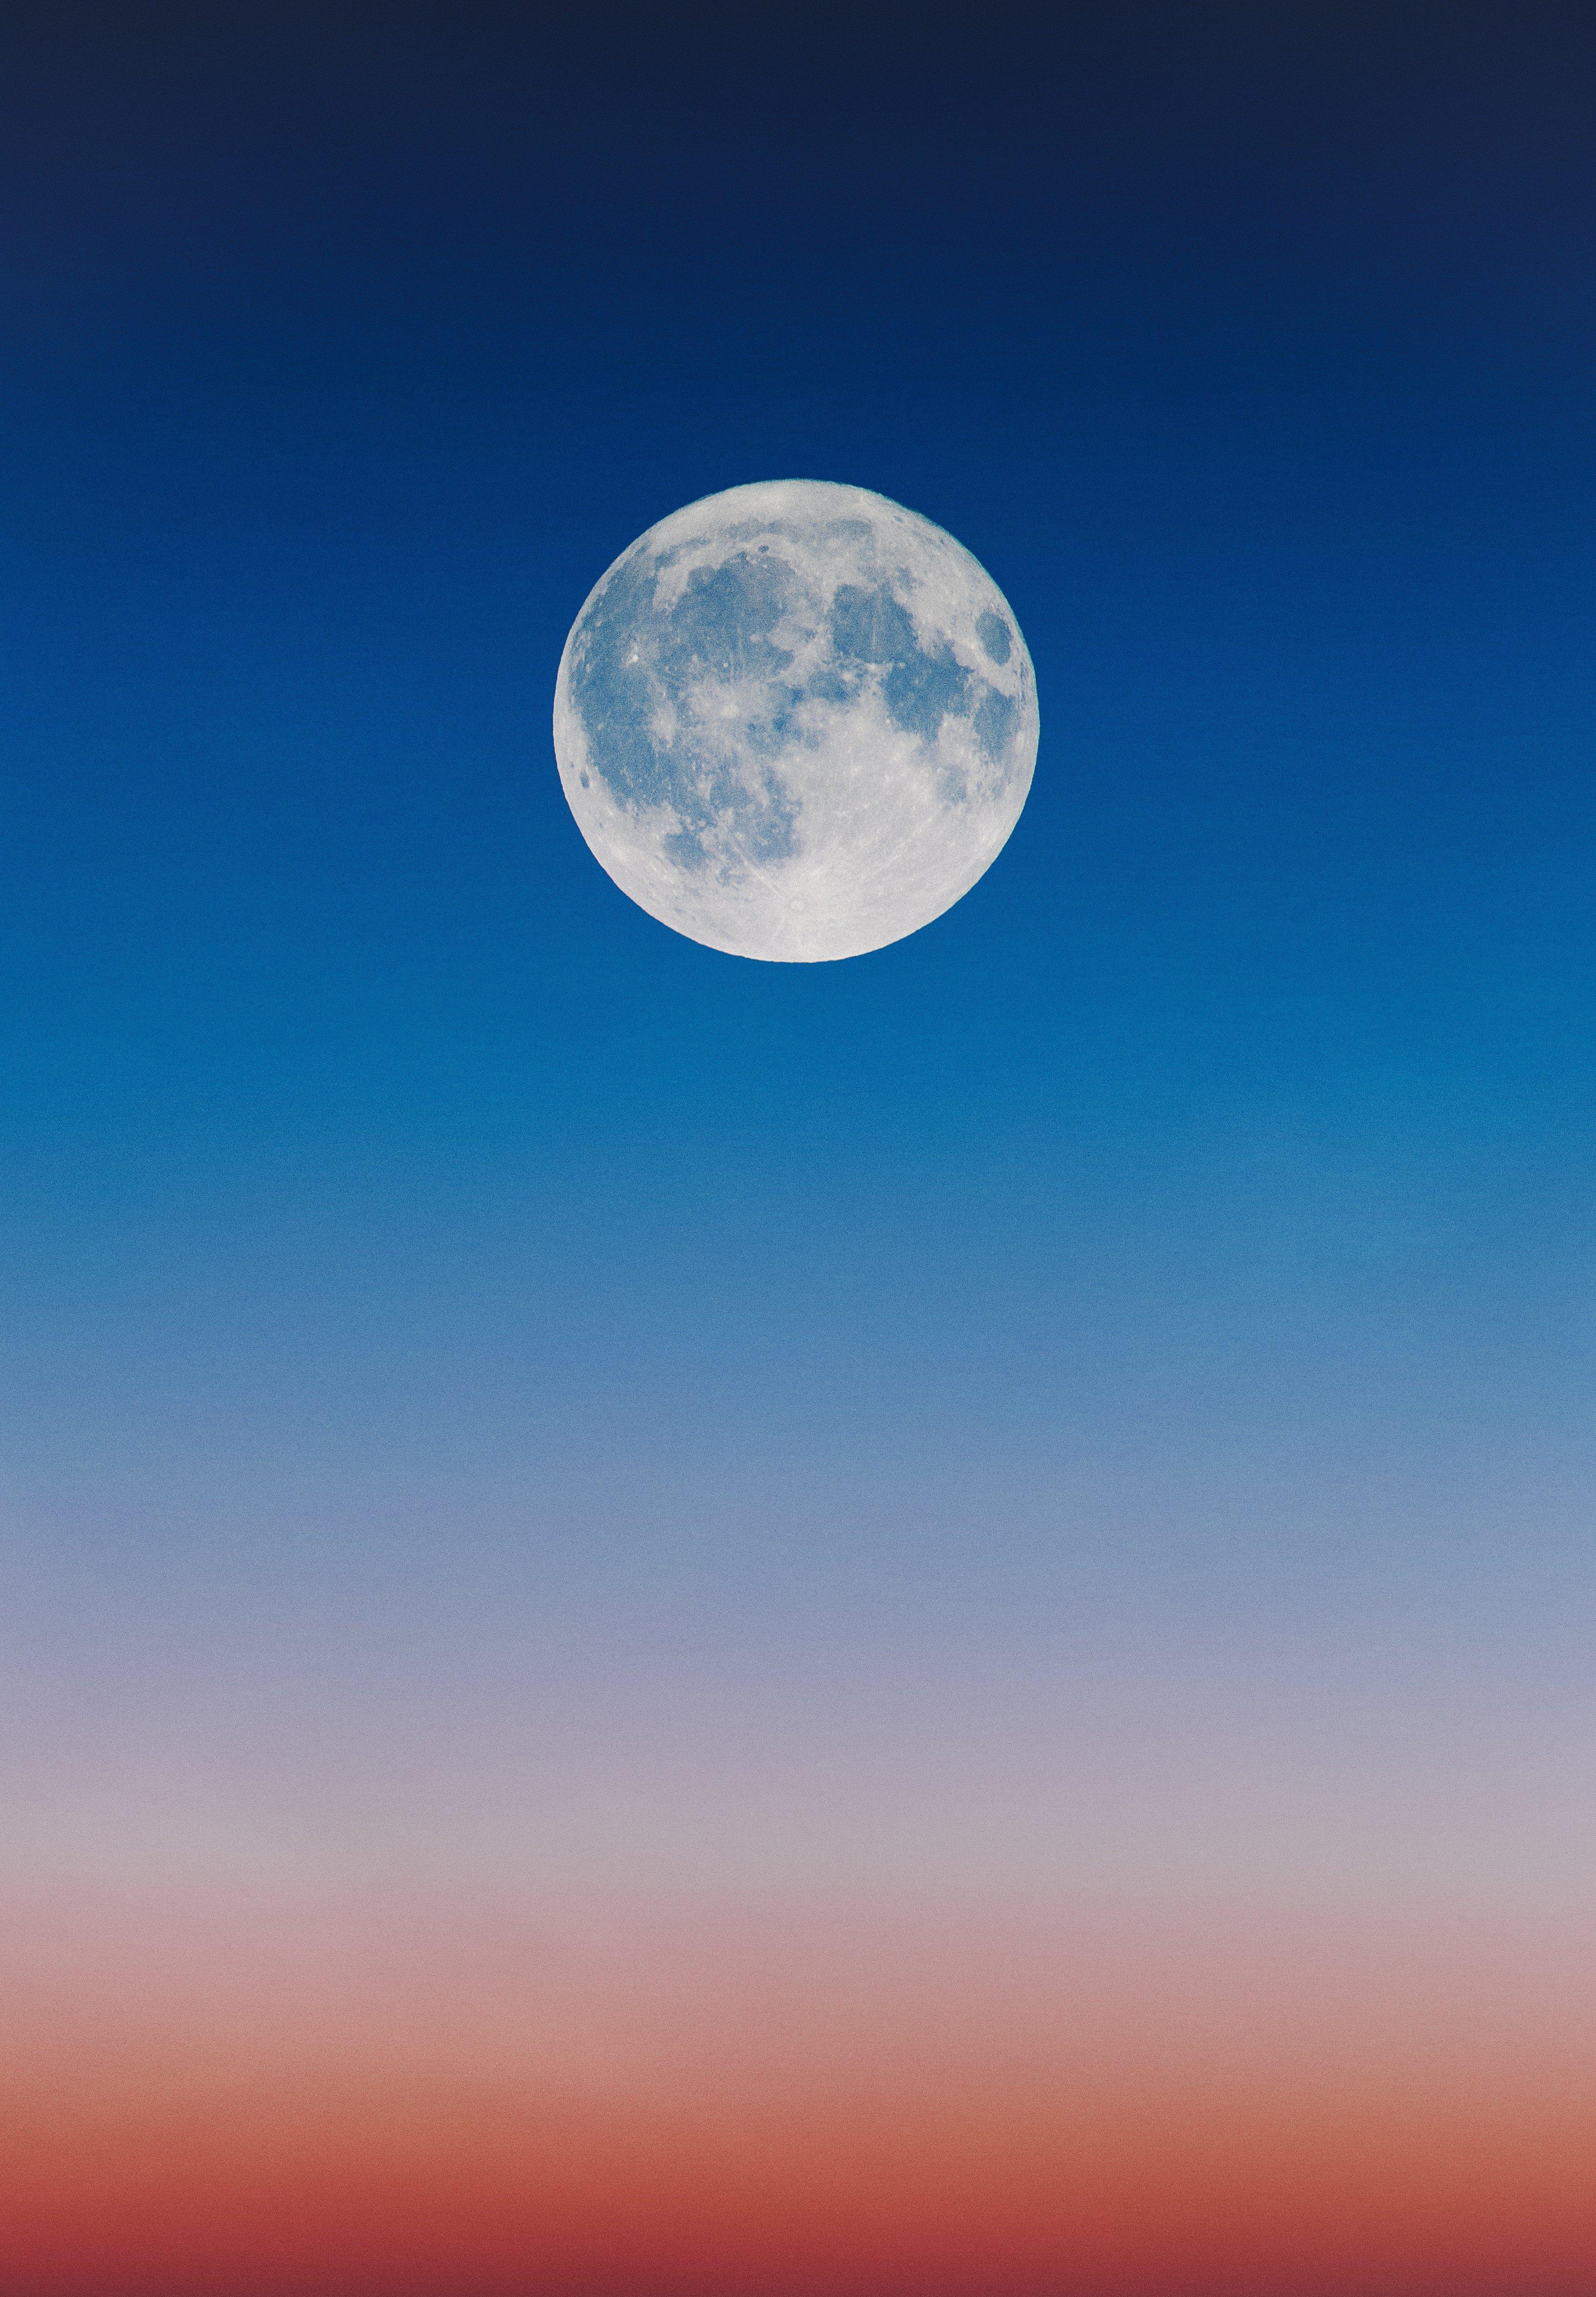 Full Moon Illustration — Steemit